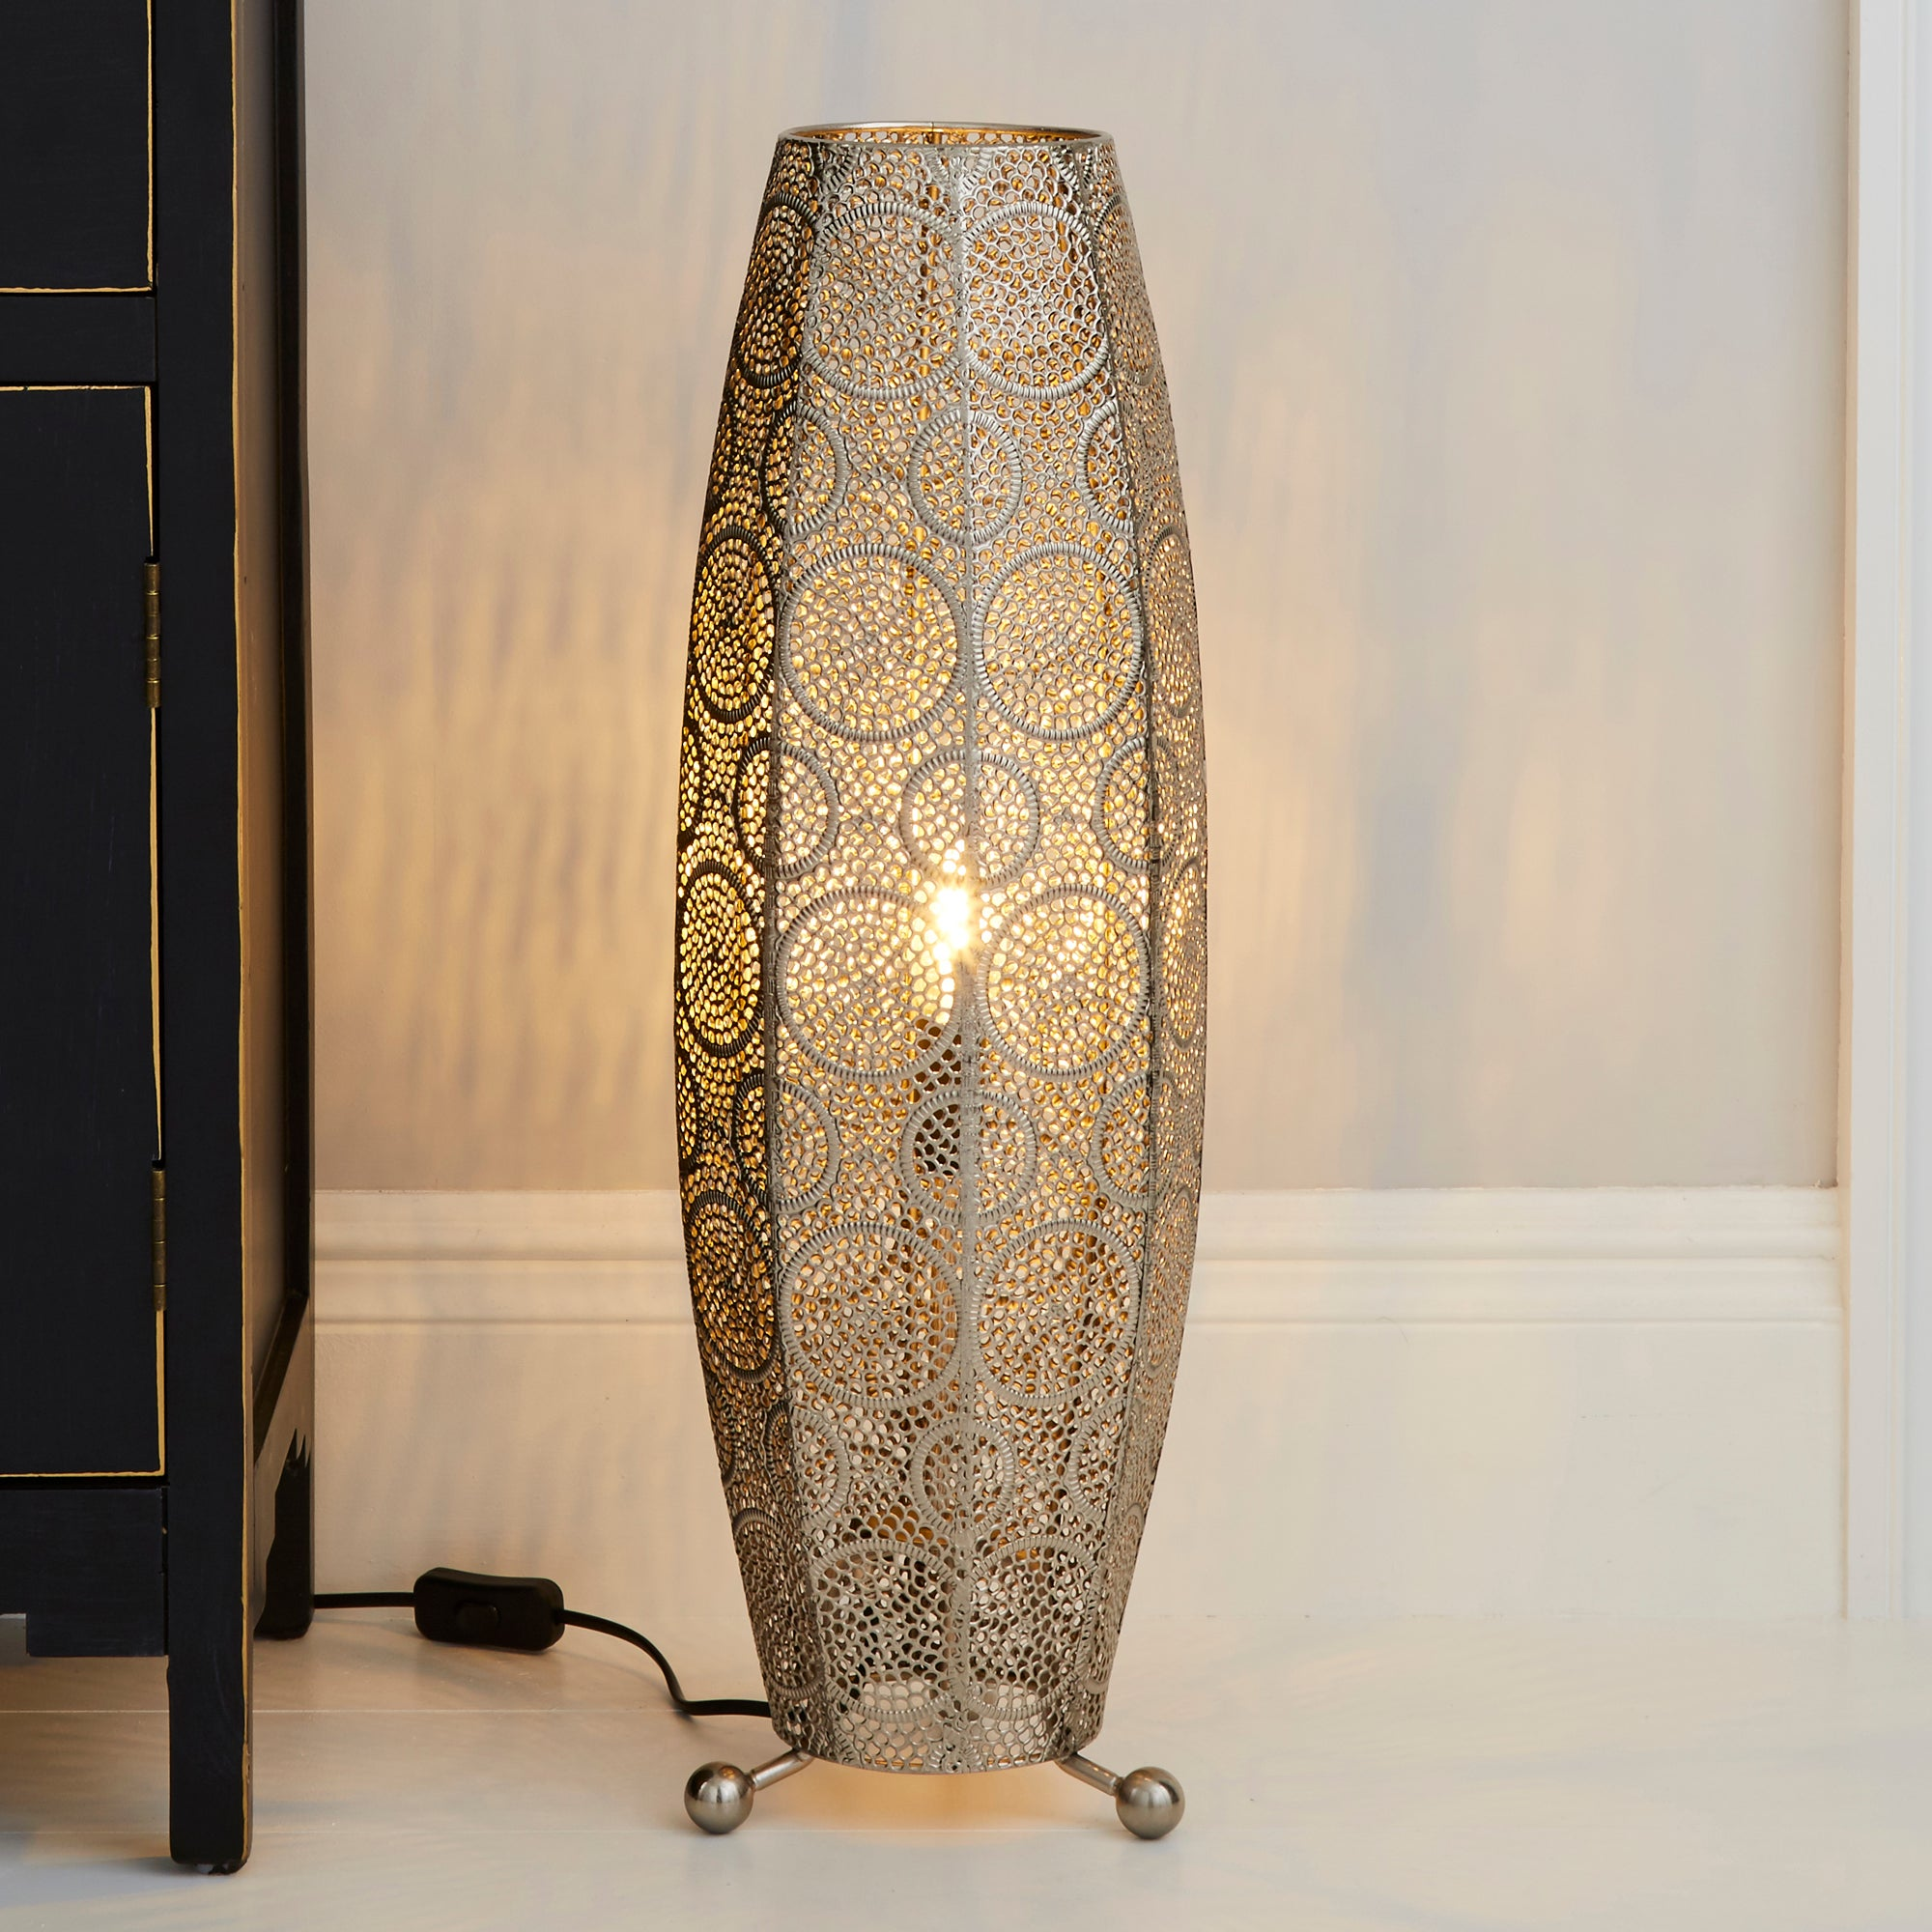 Manila Moroccan 60cm Chrome Floor Lamp Silver